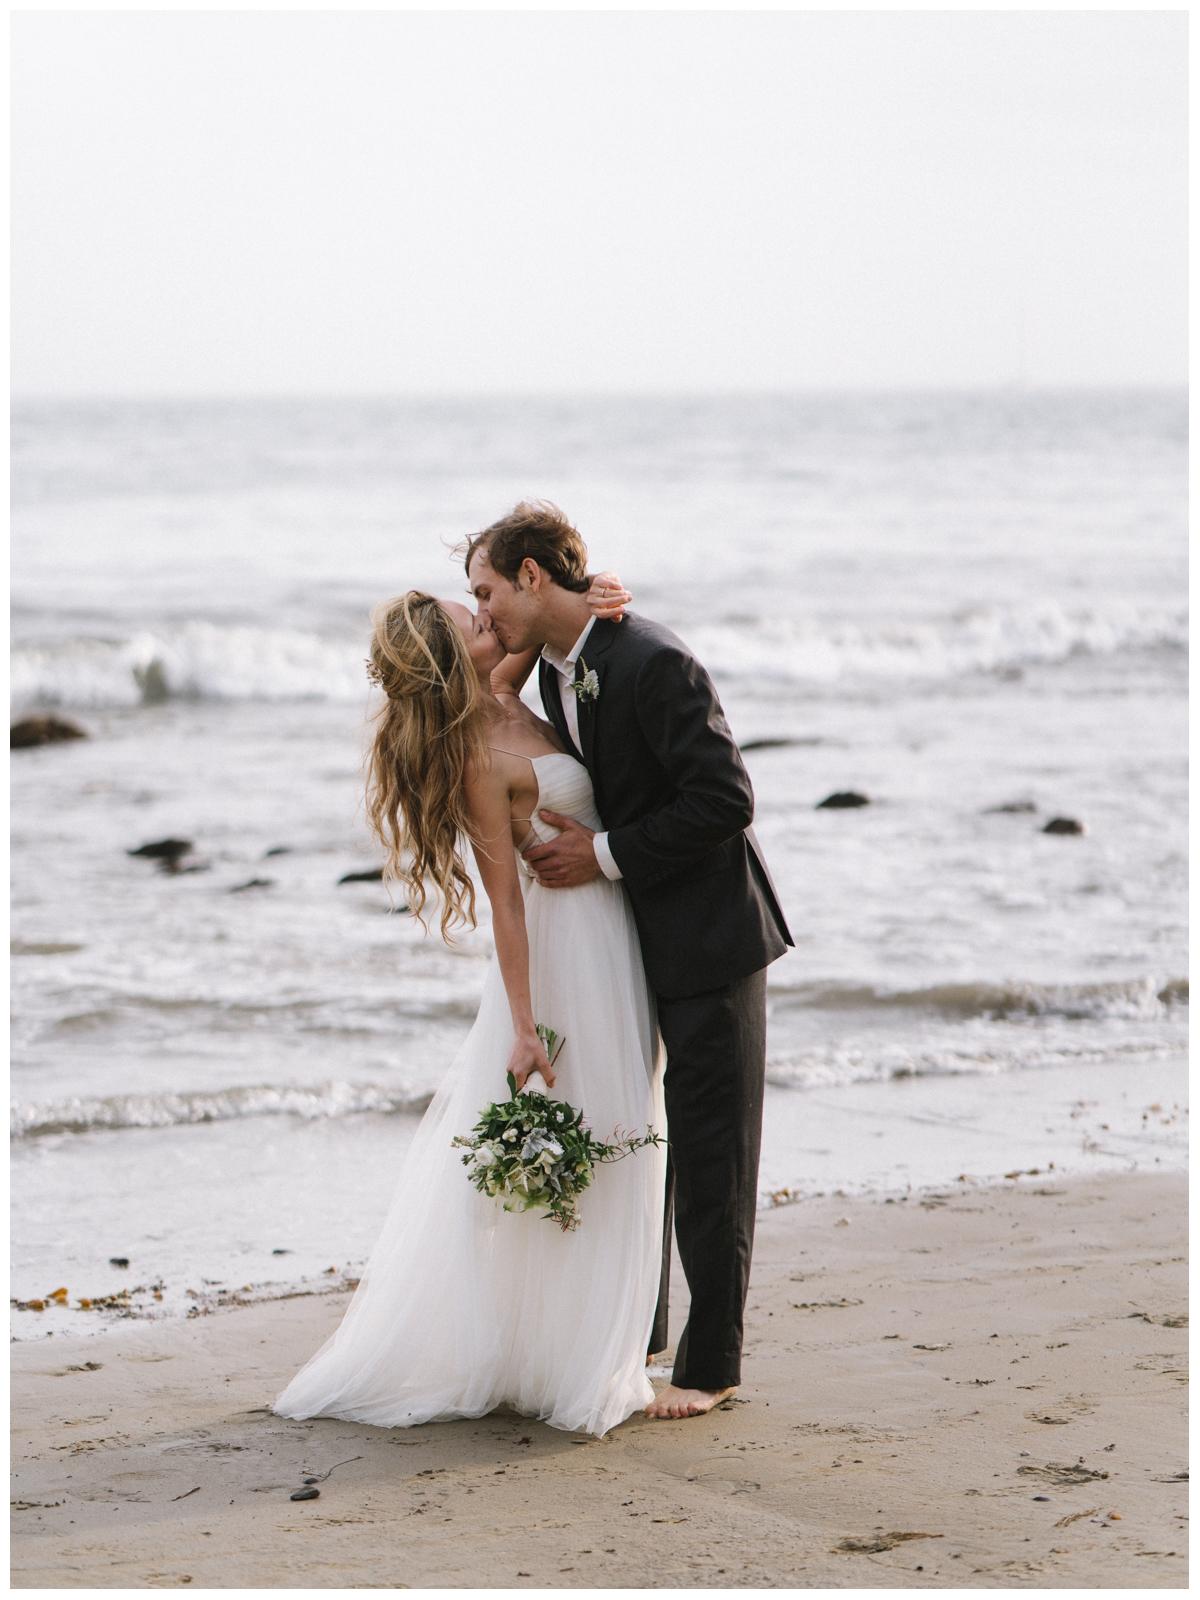 Santa Babara Elopement Wedding Photographer - Pinnel Photography-18.jpg